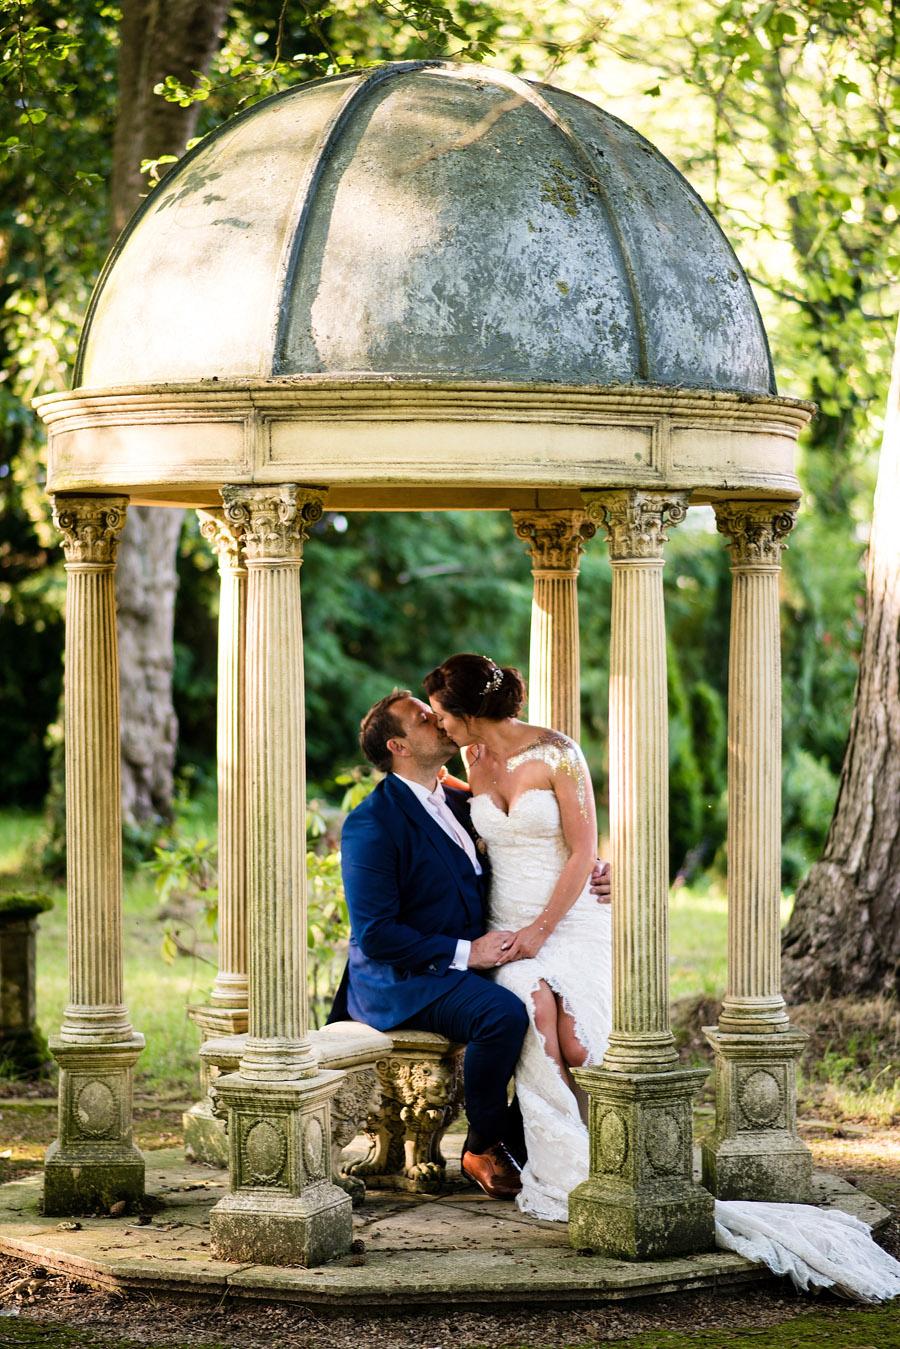 Emma & Paul's Beautiful English Summer garden party wedding, with Damian Burcher Photography (1)